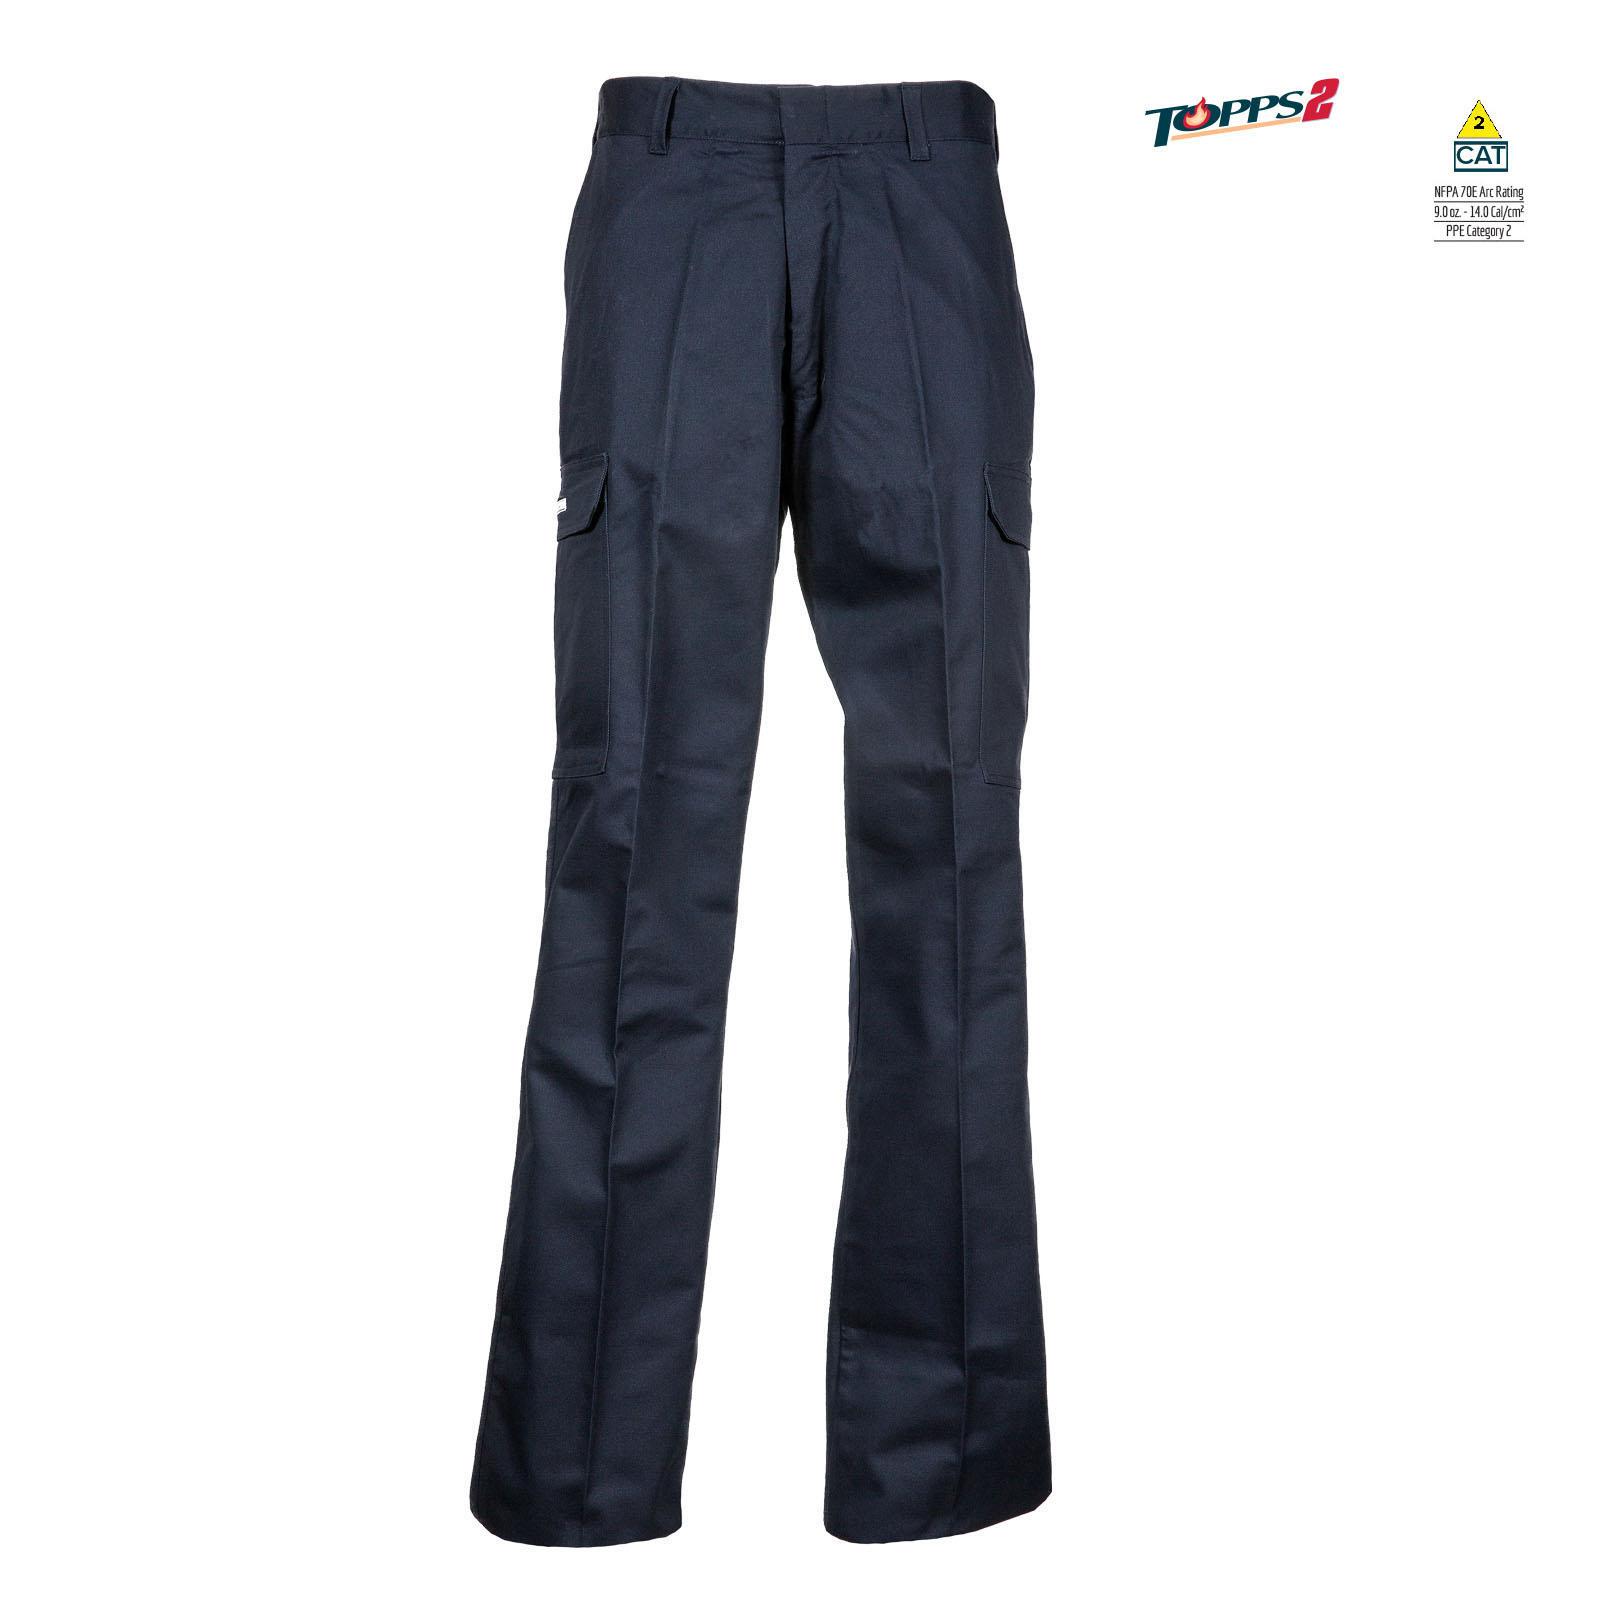 88/12 Cotton/Nylon Blend Flame Resistant Cargo Pant-TOPPS